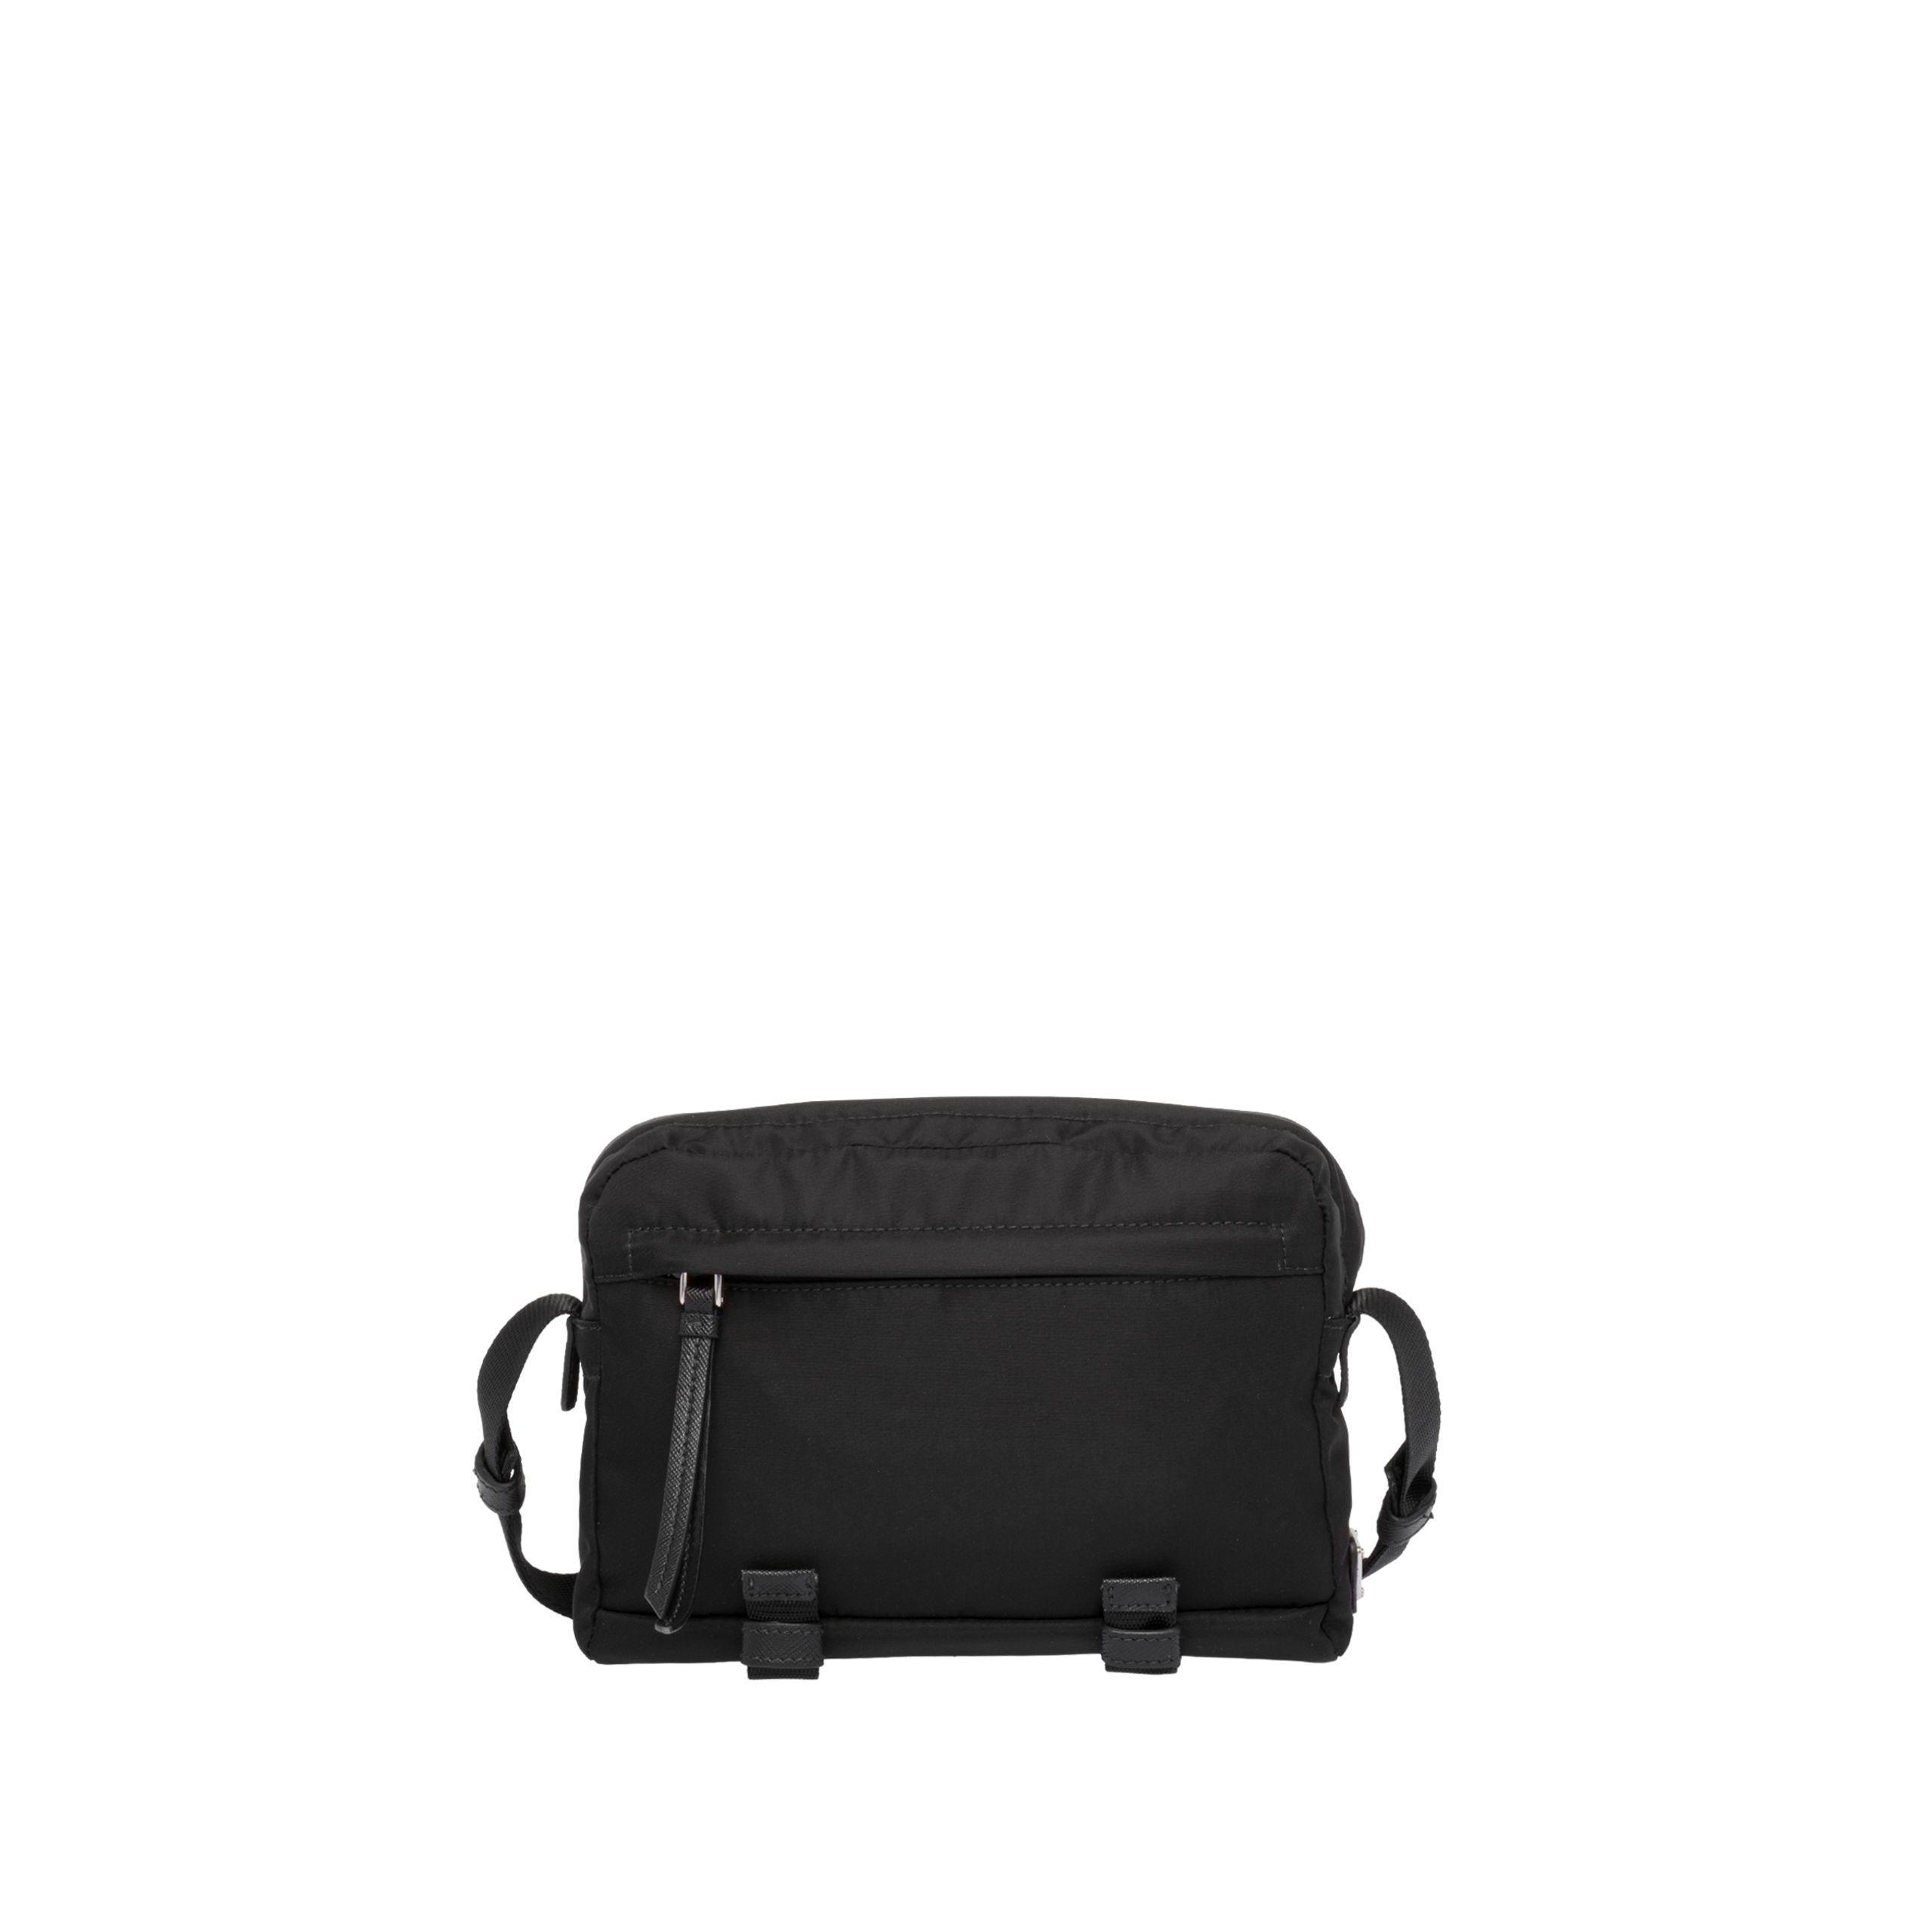 df6391ed6e4f Prada - Black Printed Technical Fabric Bandoleer Bag for Men - Lyst. View  fullscreen